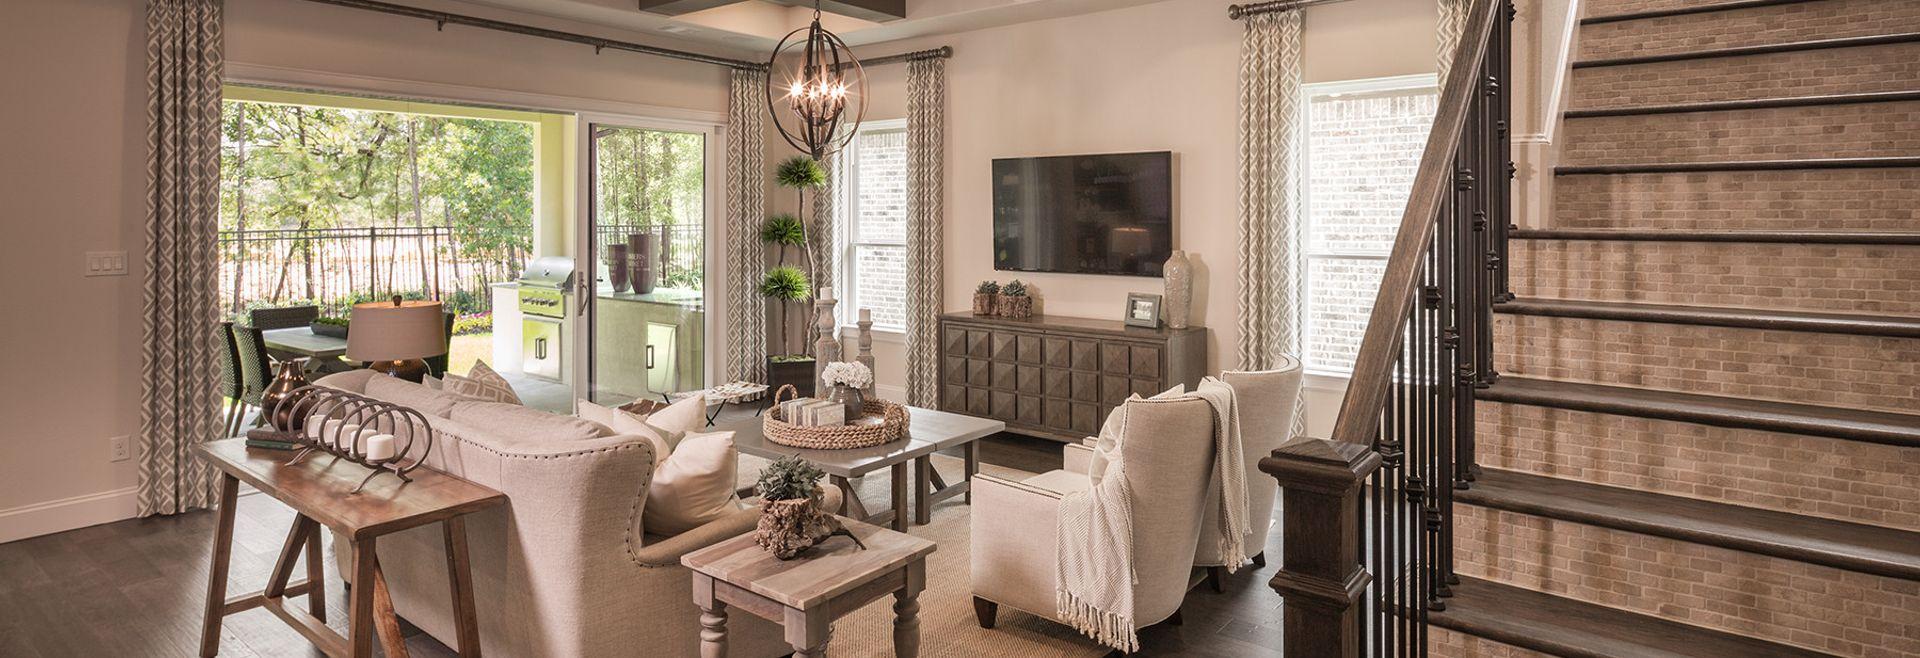 Harmony 60 Plan 5137 Living Room